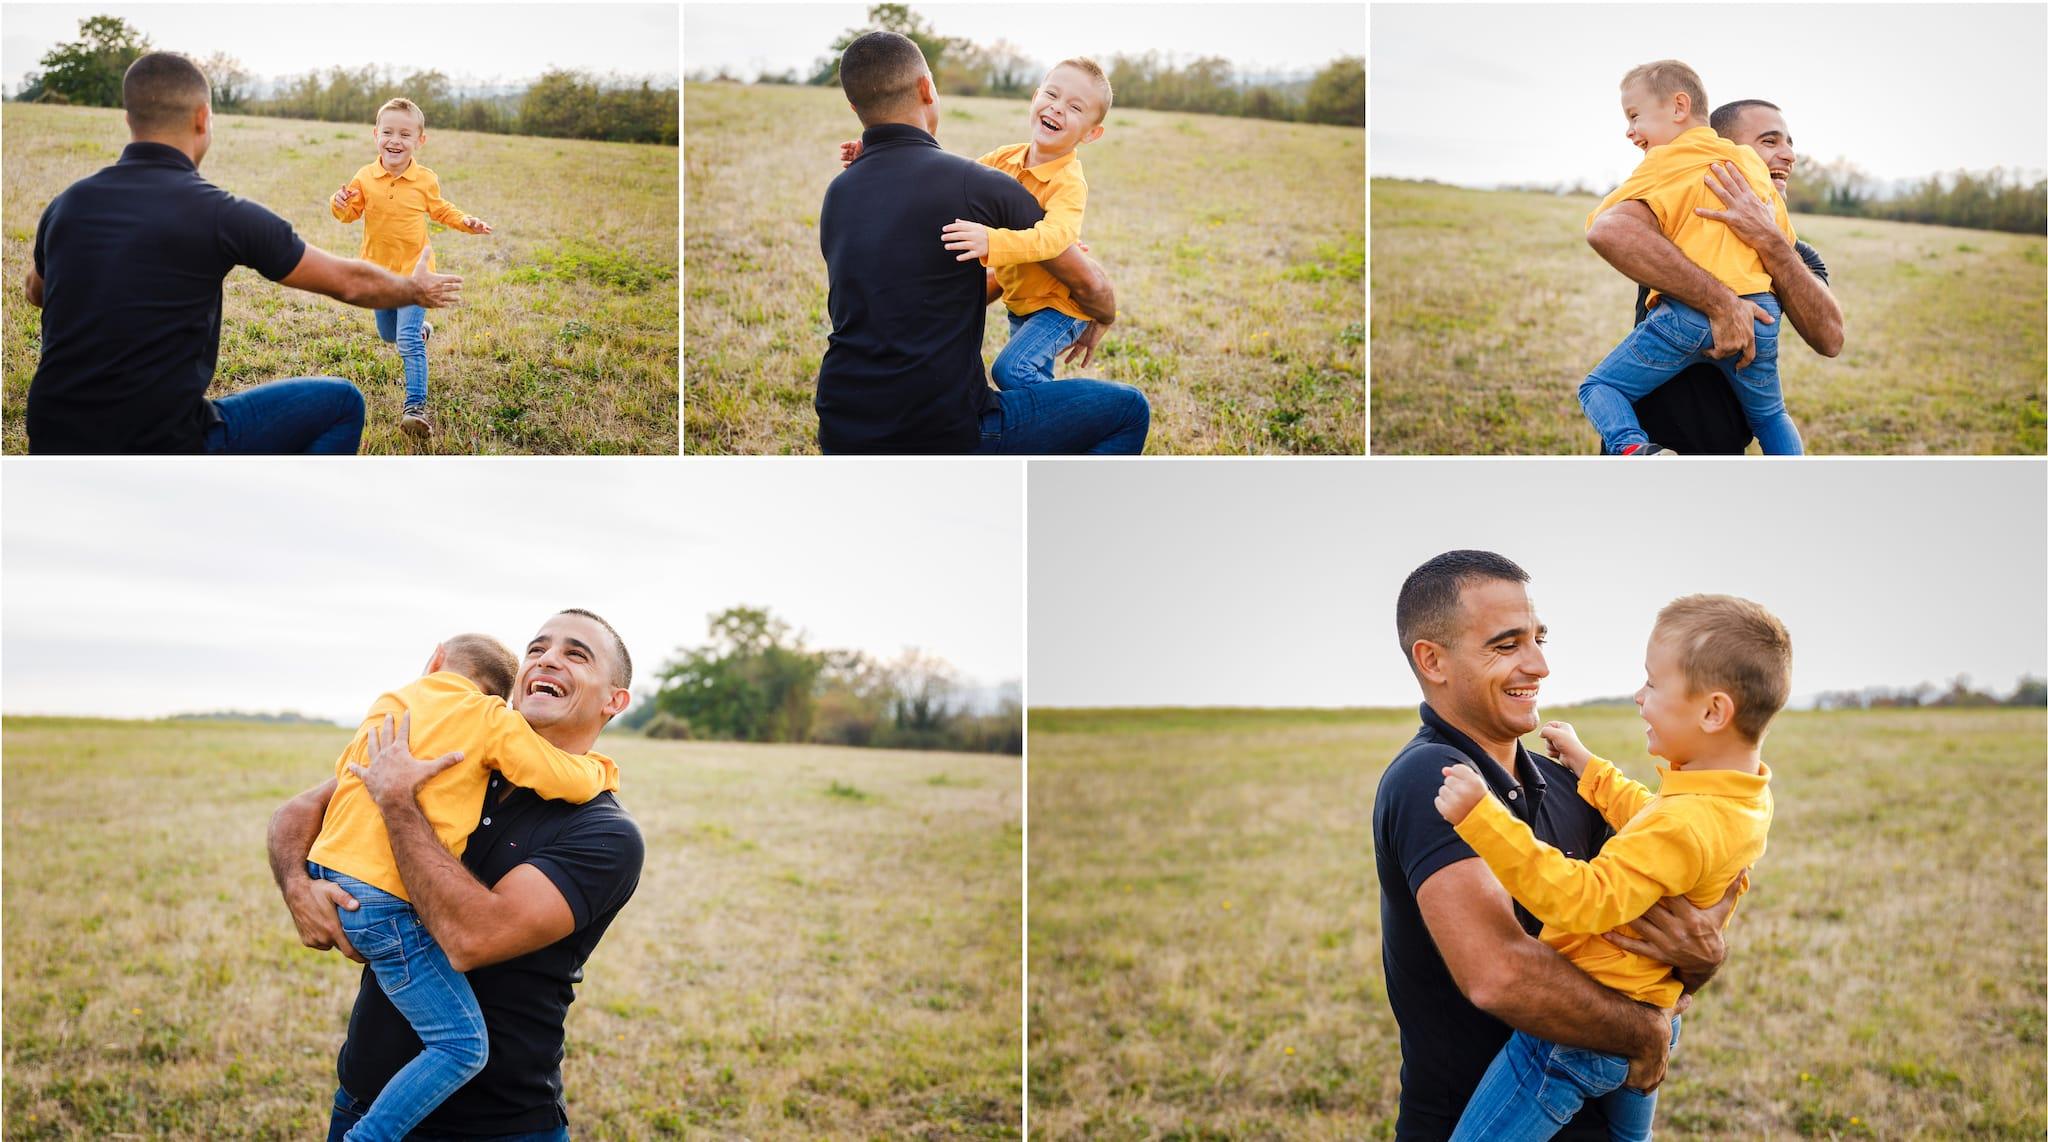 communay ; photographe de famille ; photographe de mariage